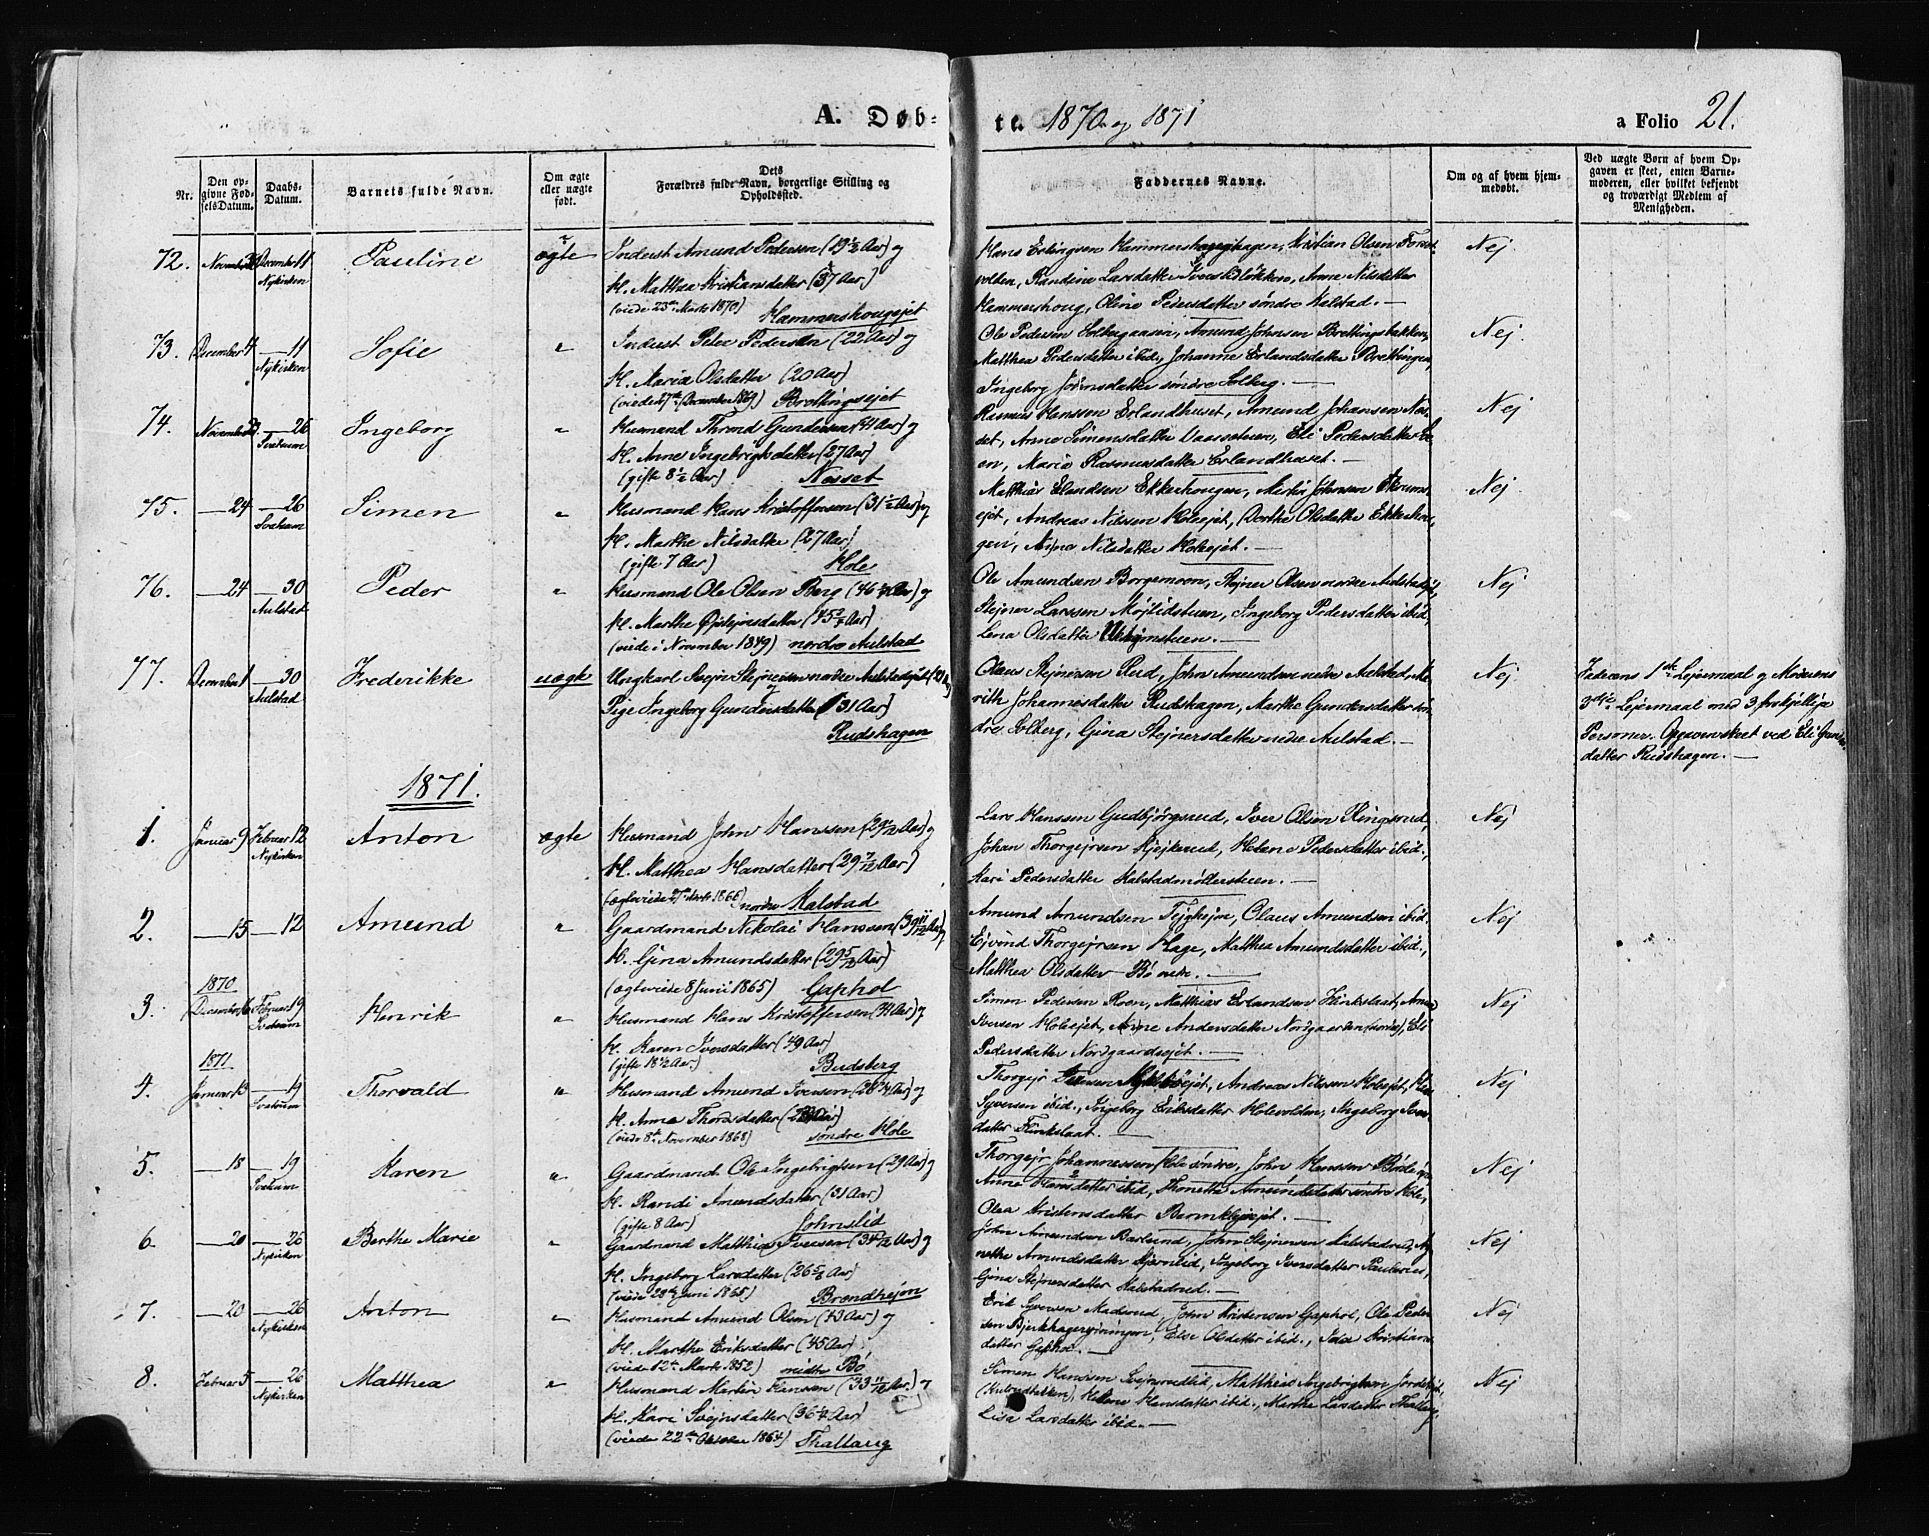 SAH, Gausdal prestekontor, Ministerialbok nr. 10, 1867-1886, s. 21